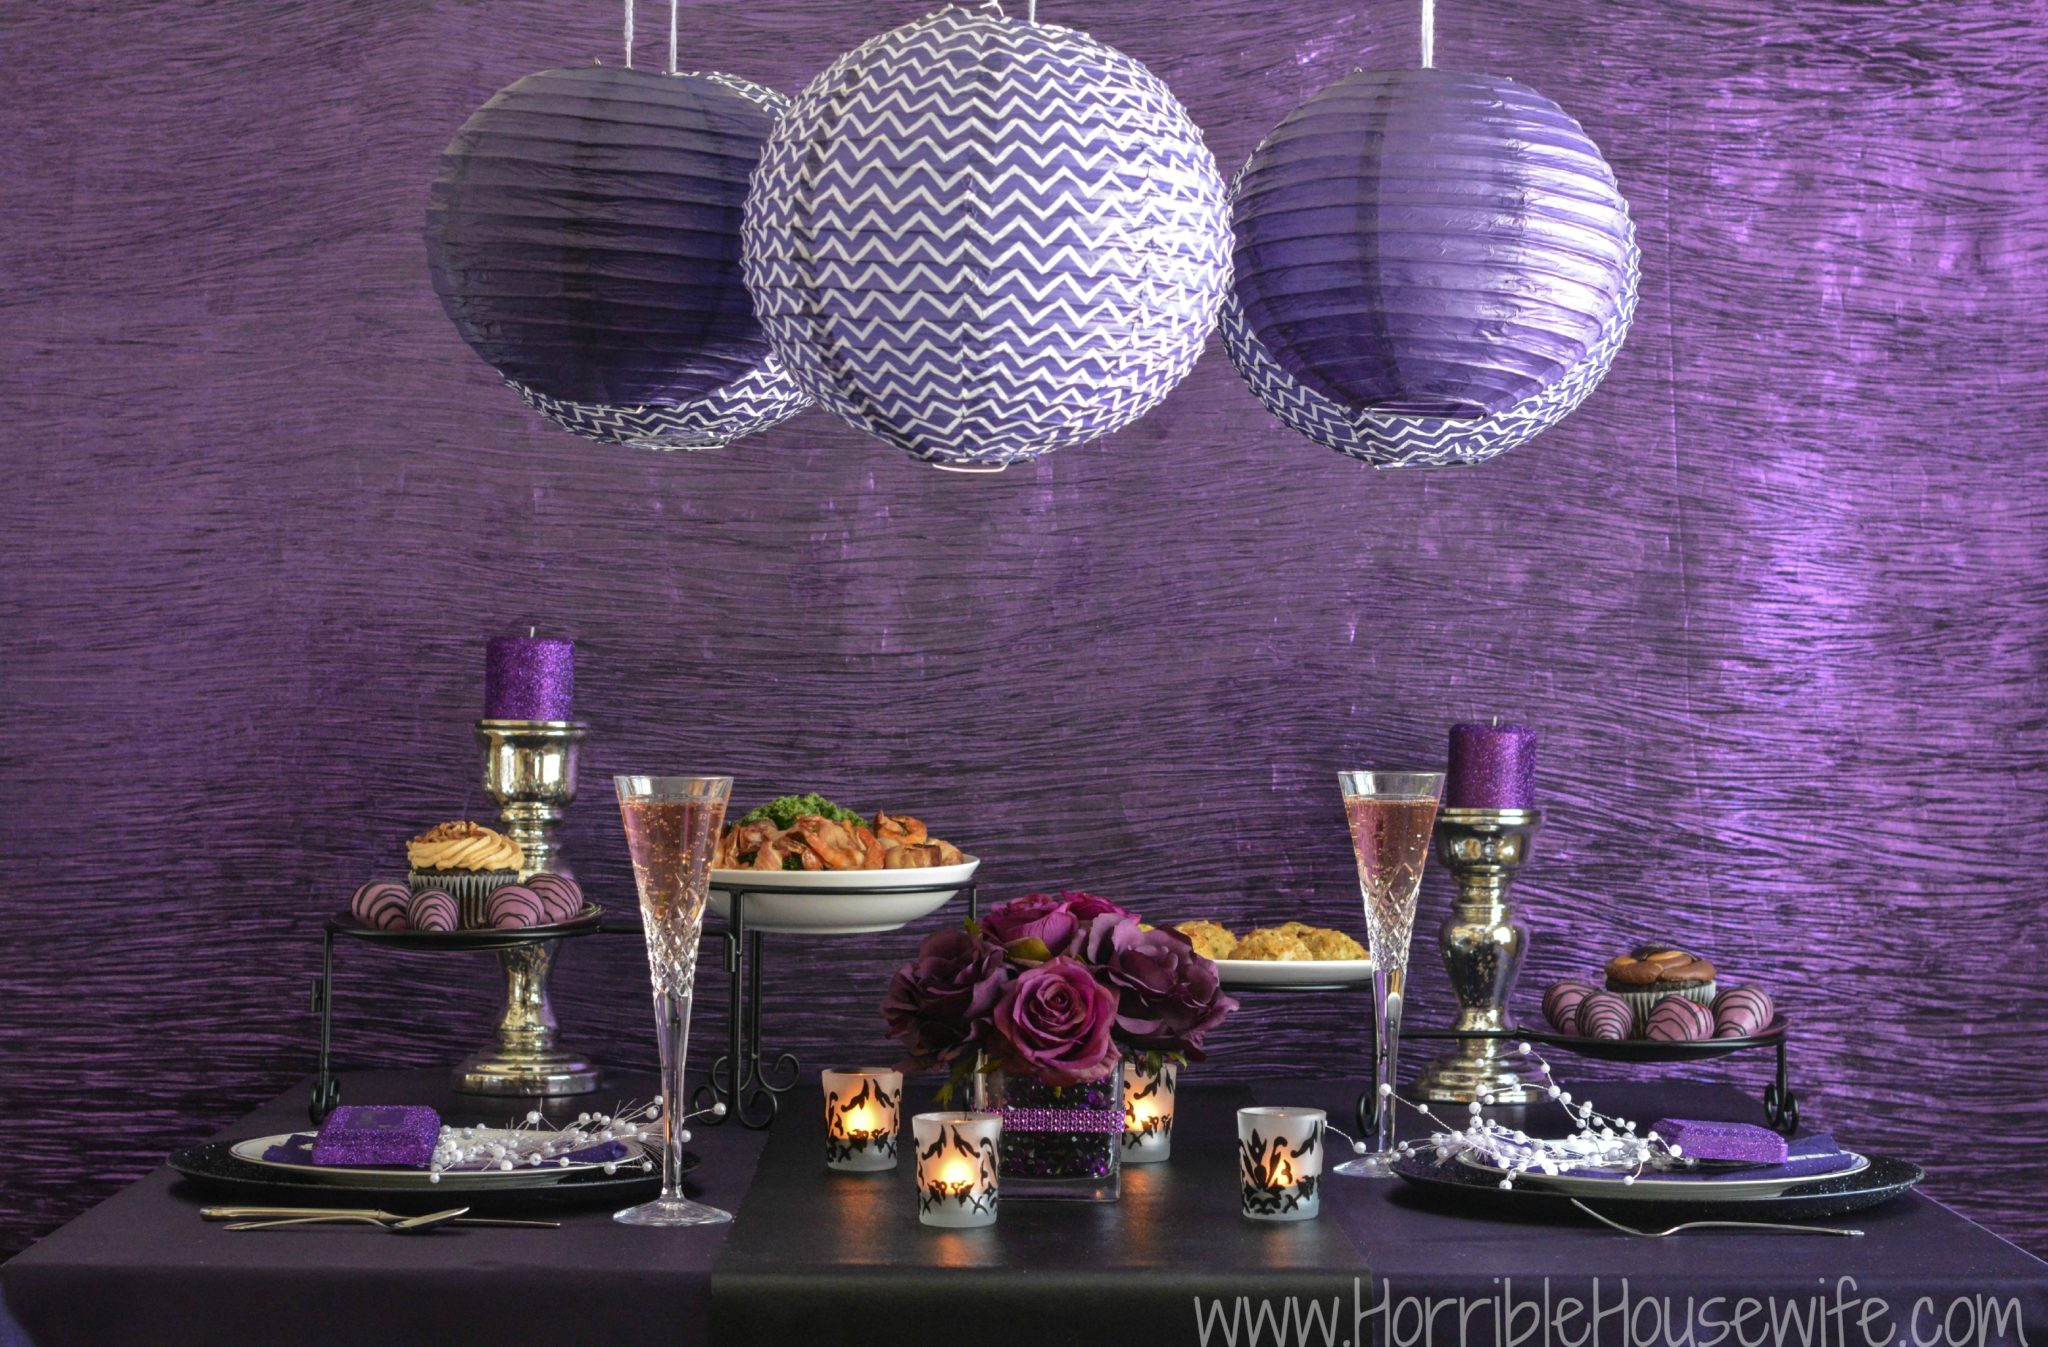 DIY paper lantern in many shades of purple